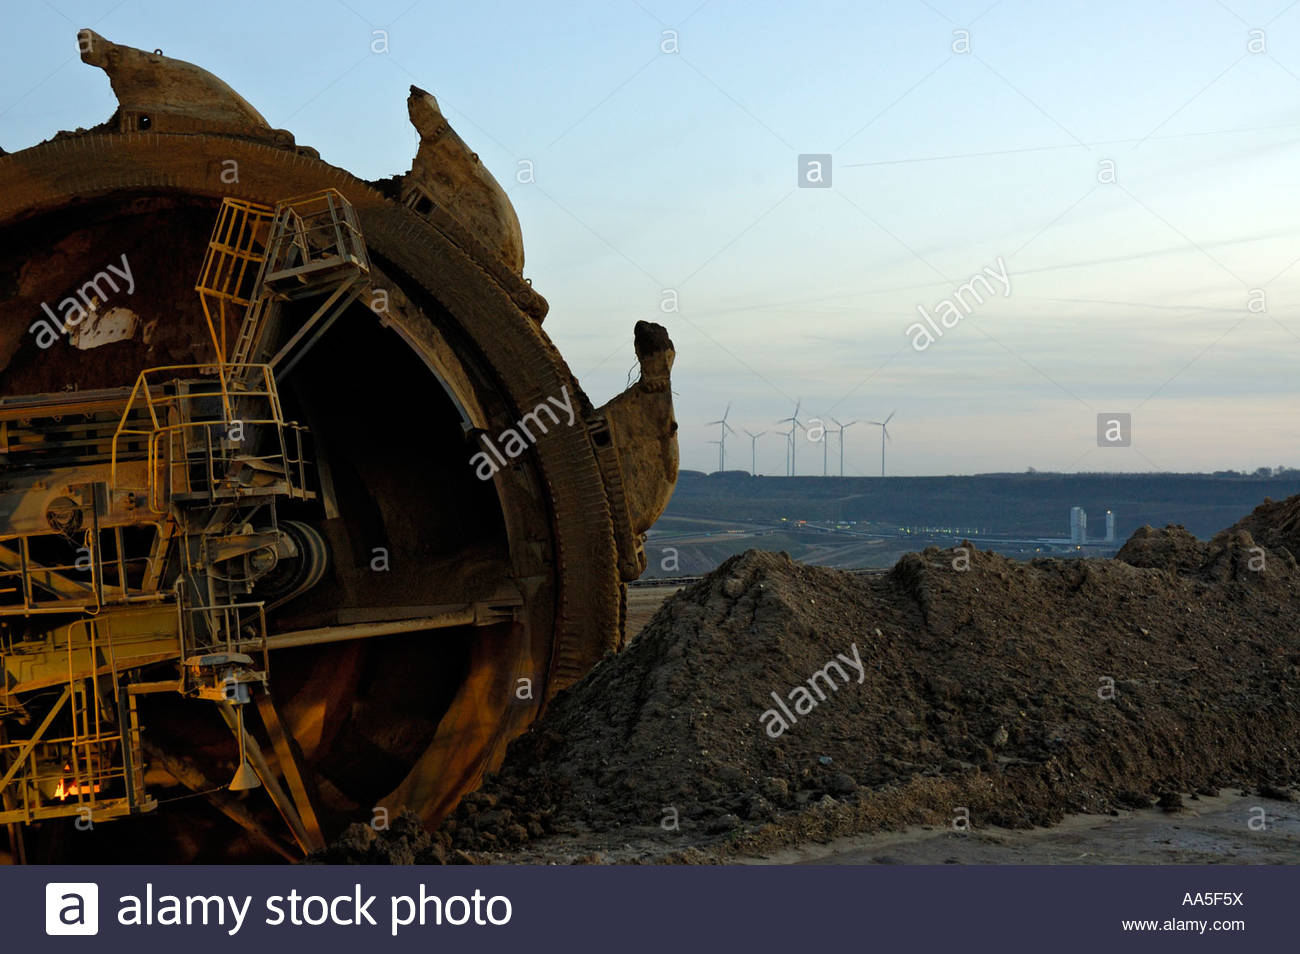 Mining Coal Excavator Rotary Stock Photos & Mining Coal Excavator.